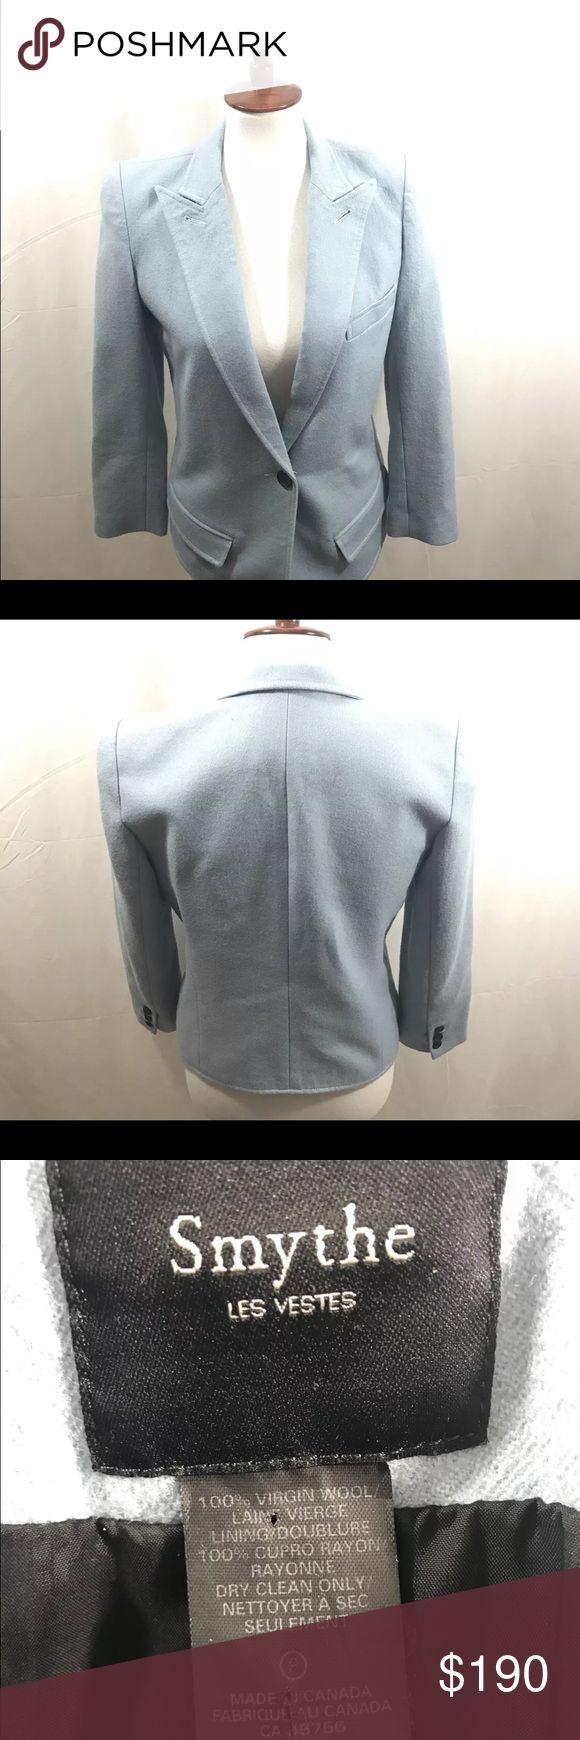 Smythe Les Vestes Virgin Wool Career Blazer Smythe Les Vestes Virgin Wool Career Blazer Women's Size 6-Blue Smythe Jackets & Coats Blazers